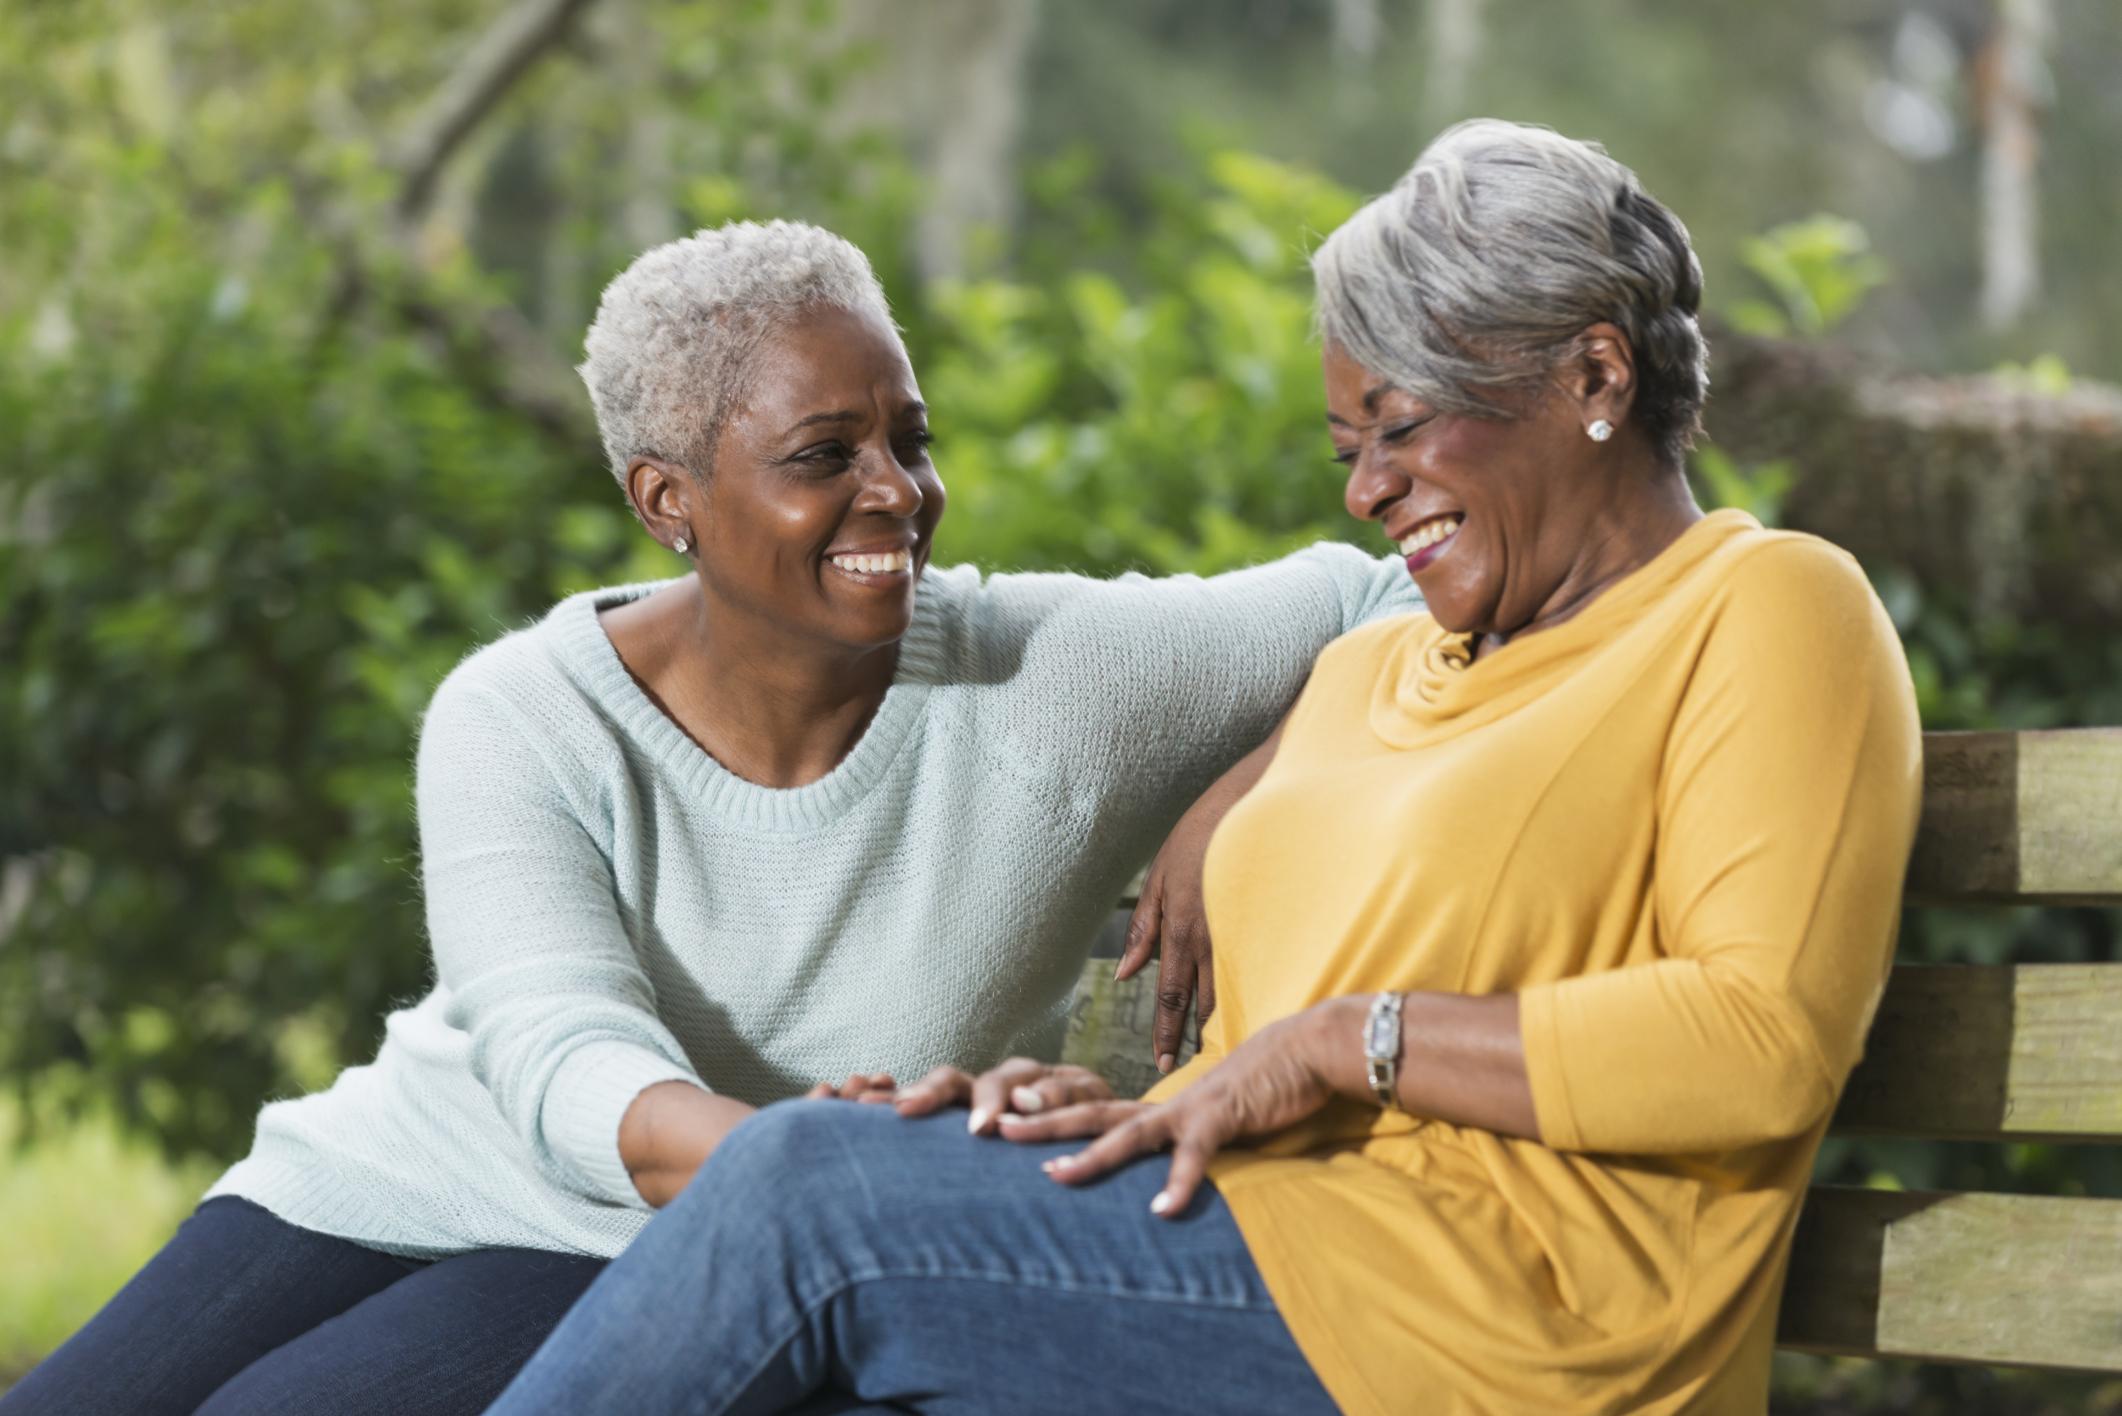 Two senior women sitting on park bench laughing